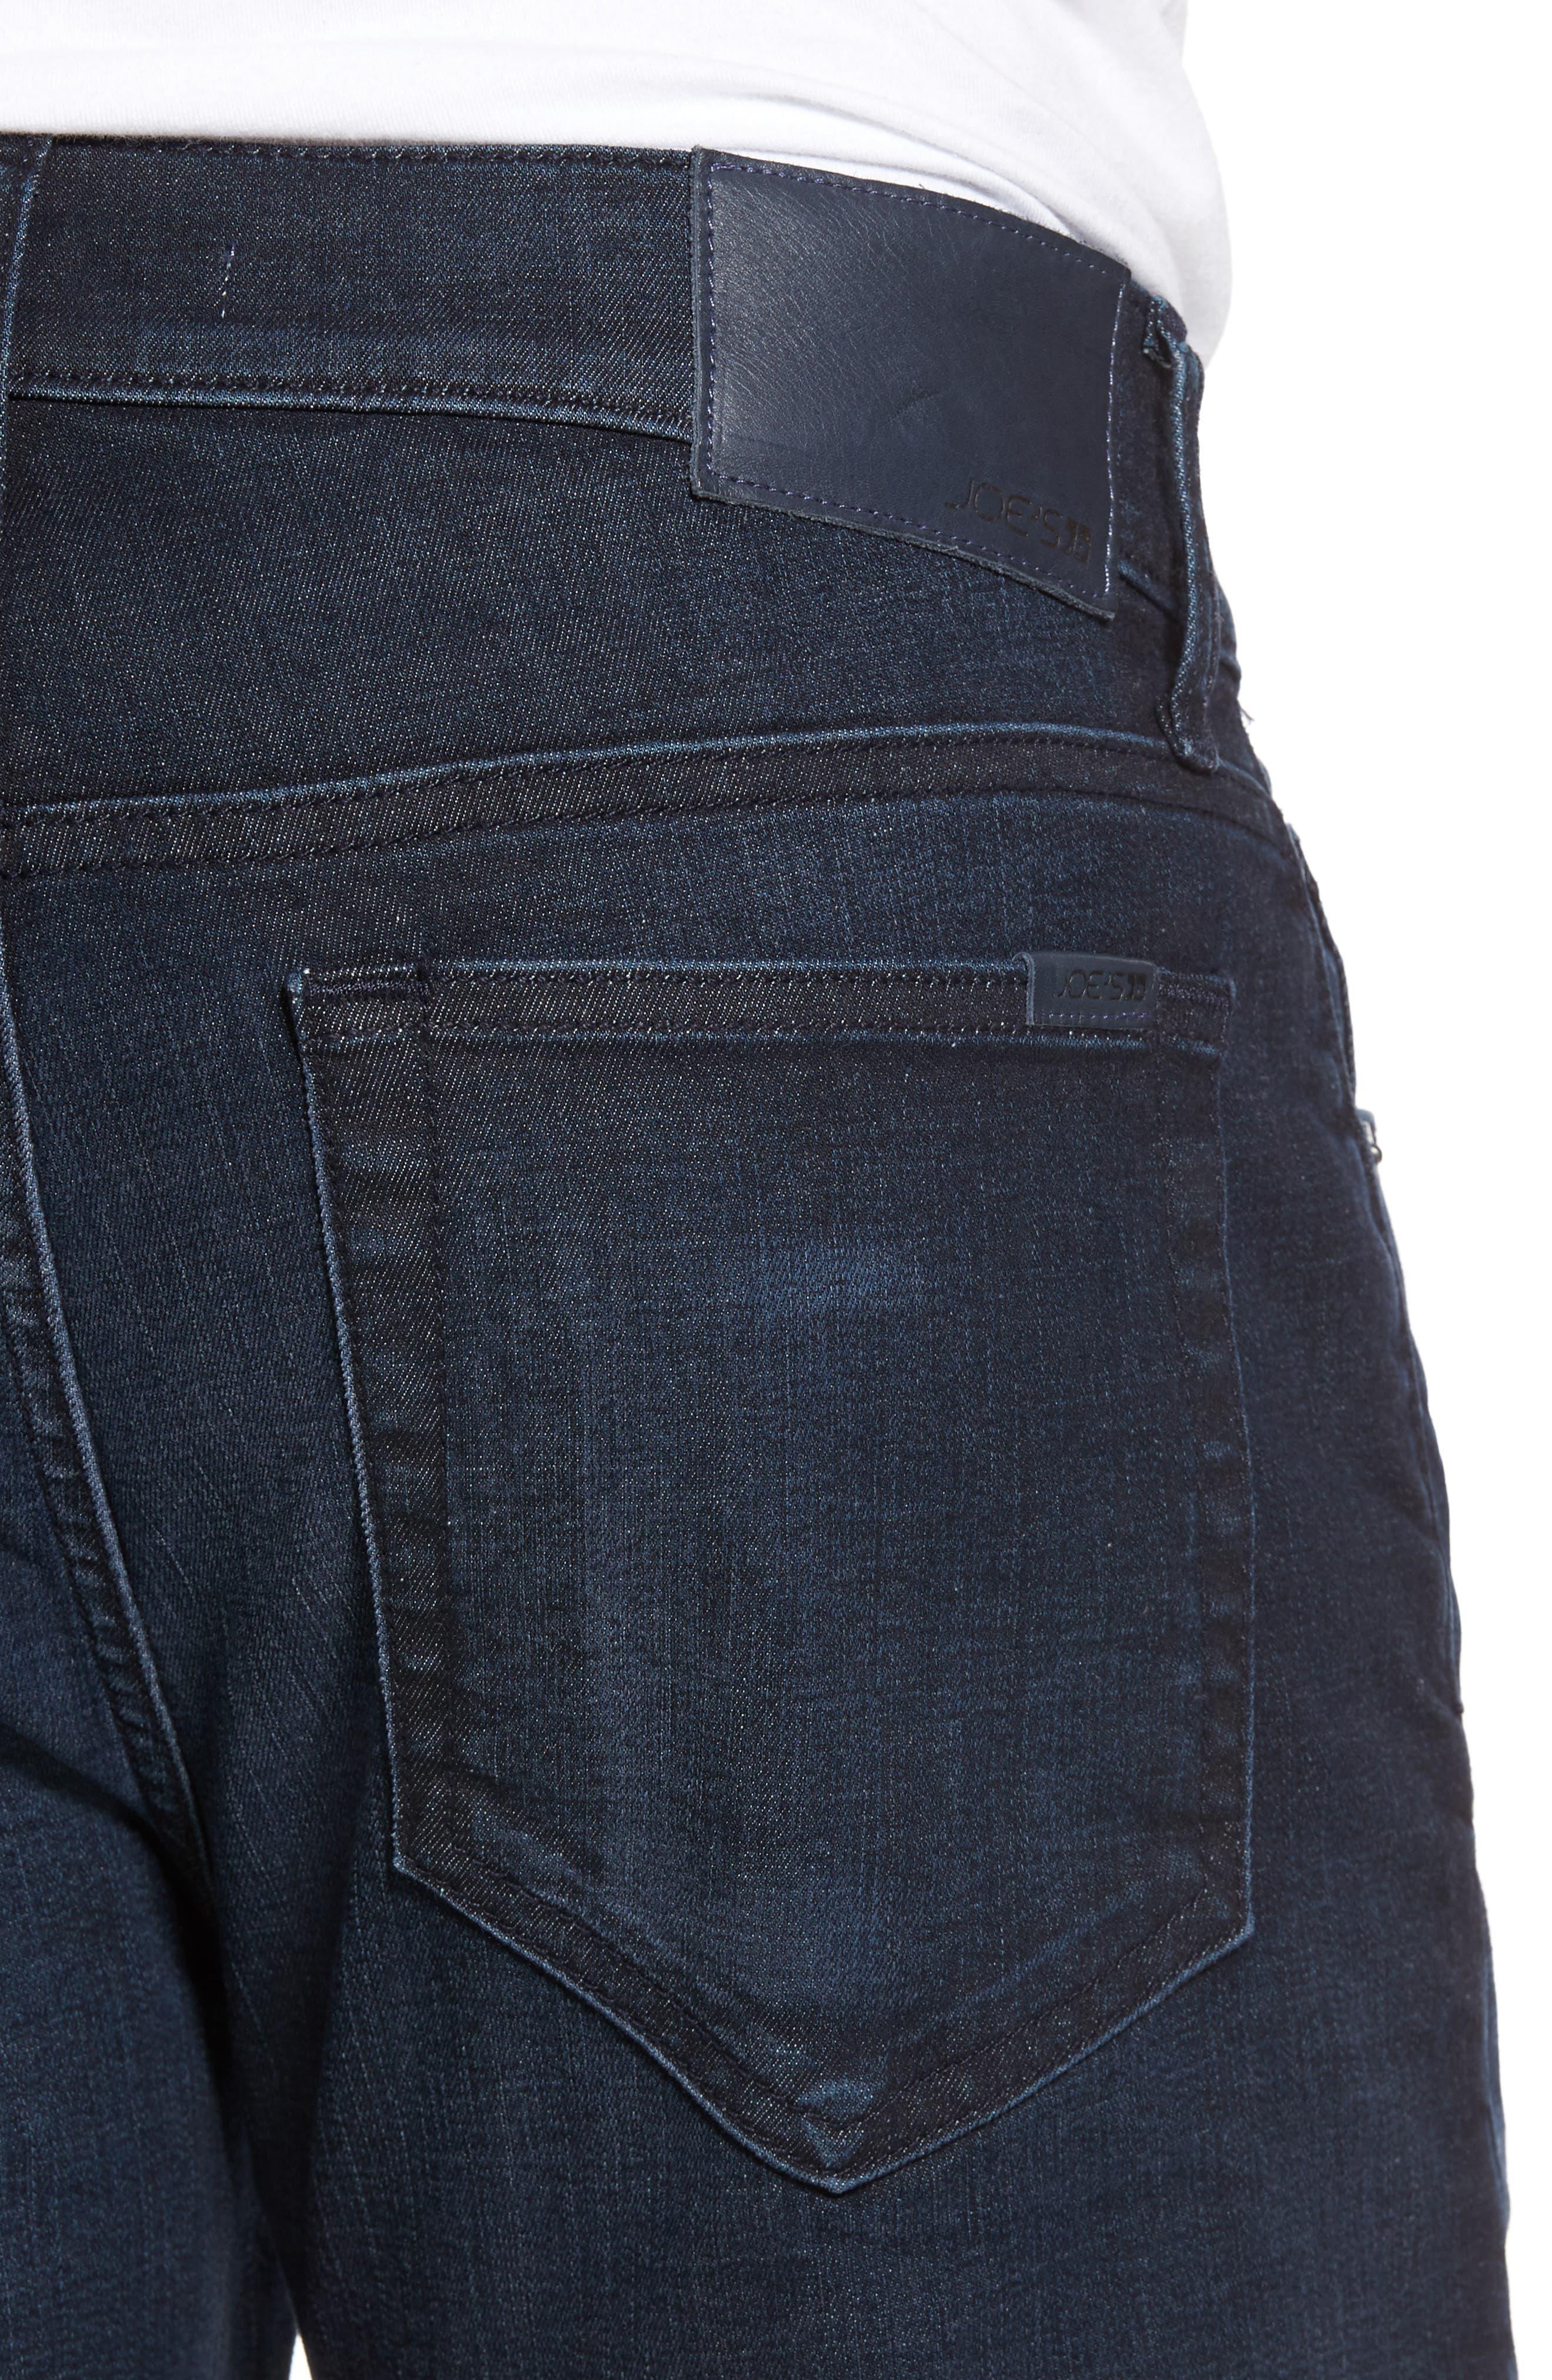 Brixton Slim Straight Leg Jeans,                             Alternate thumbnail 4, color,                             Larsen